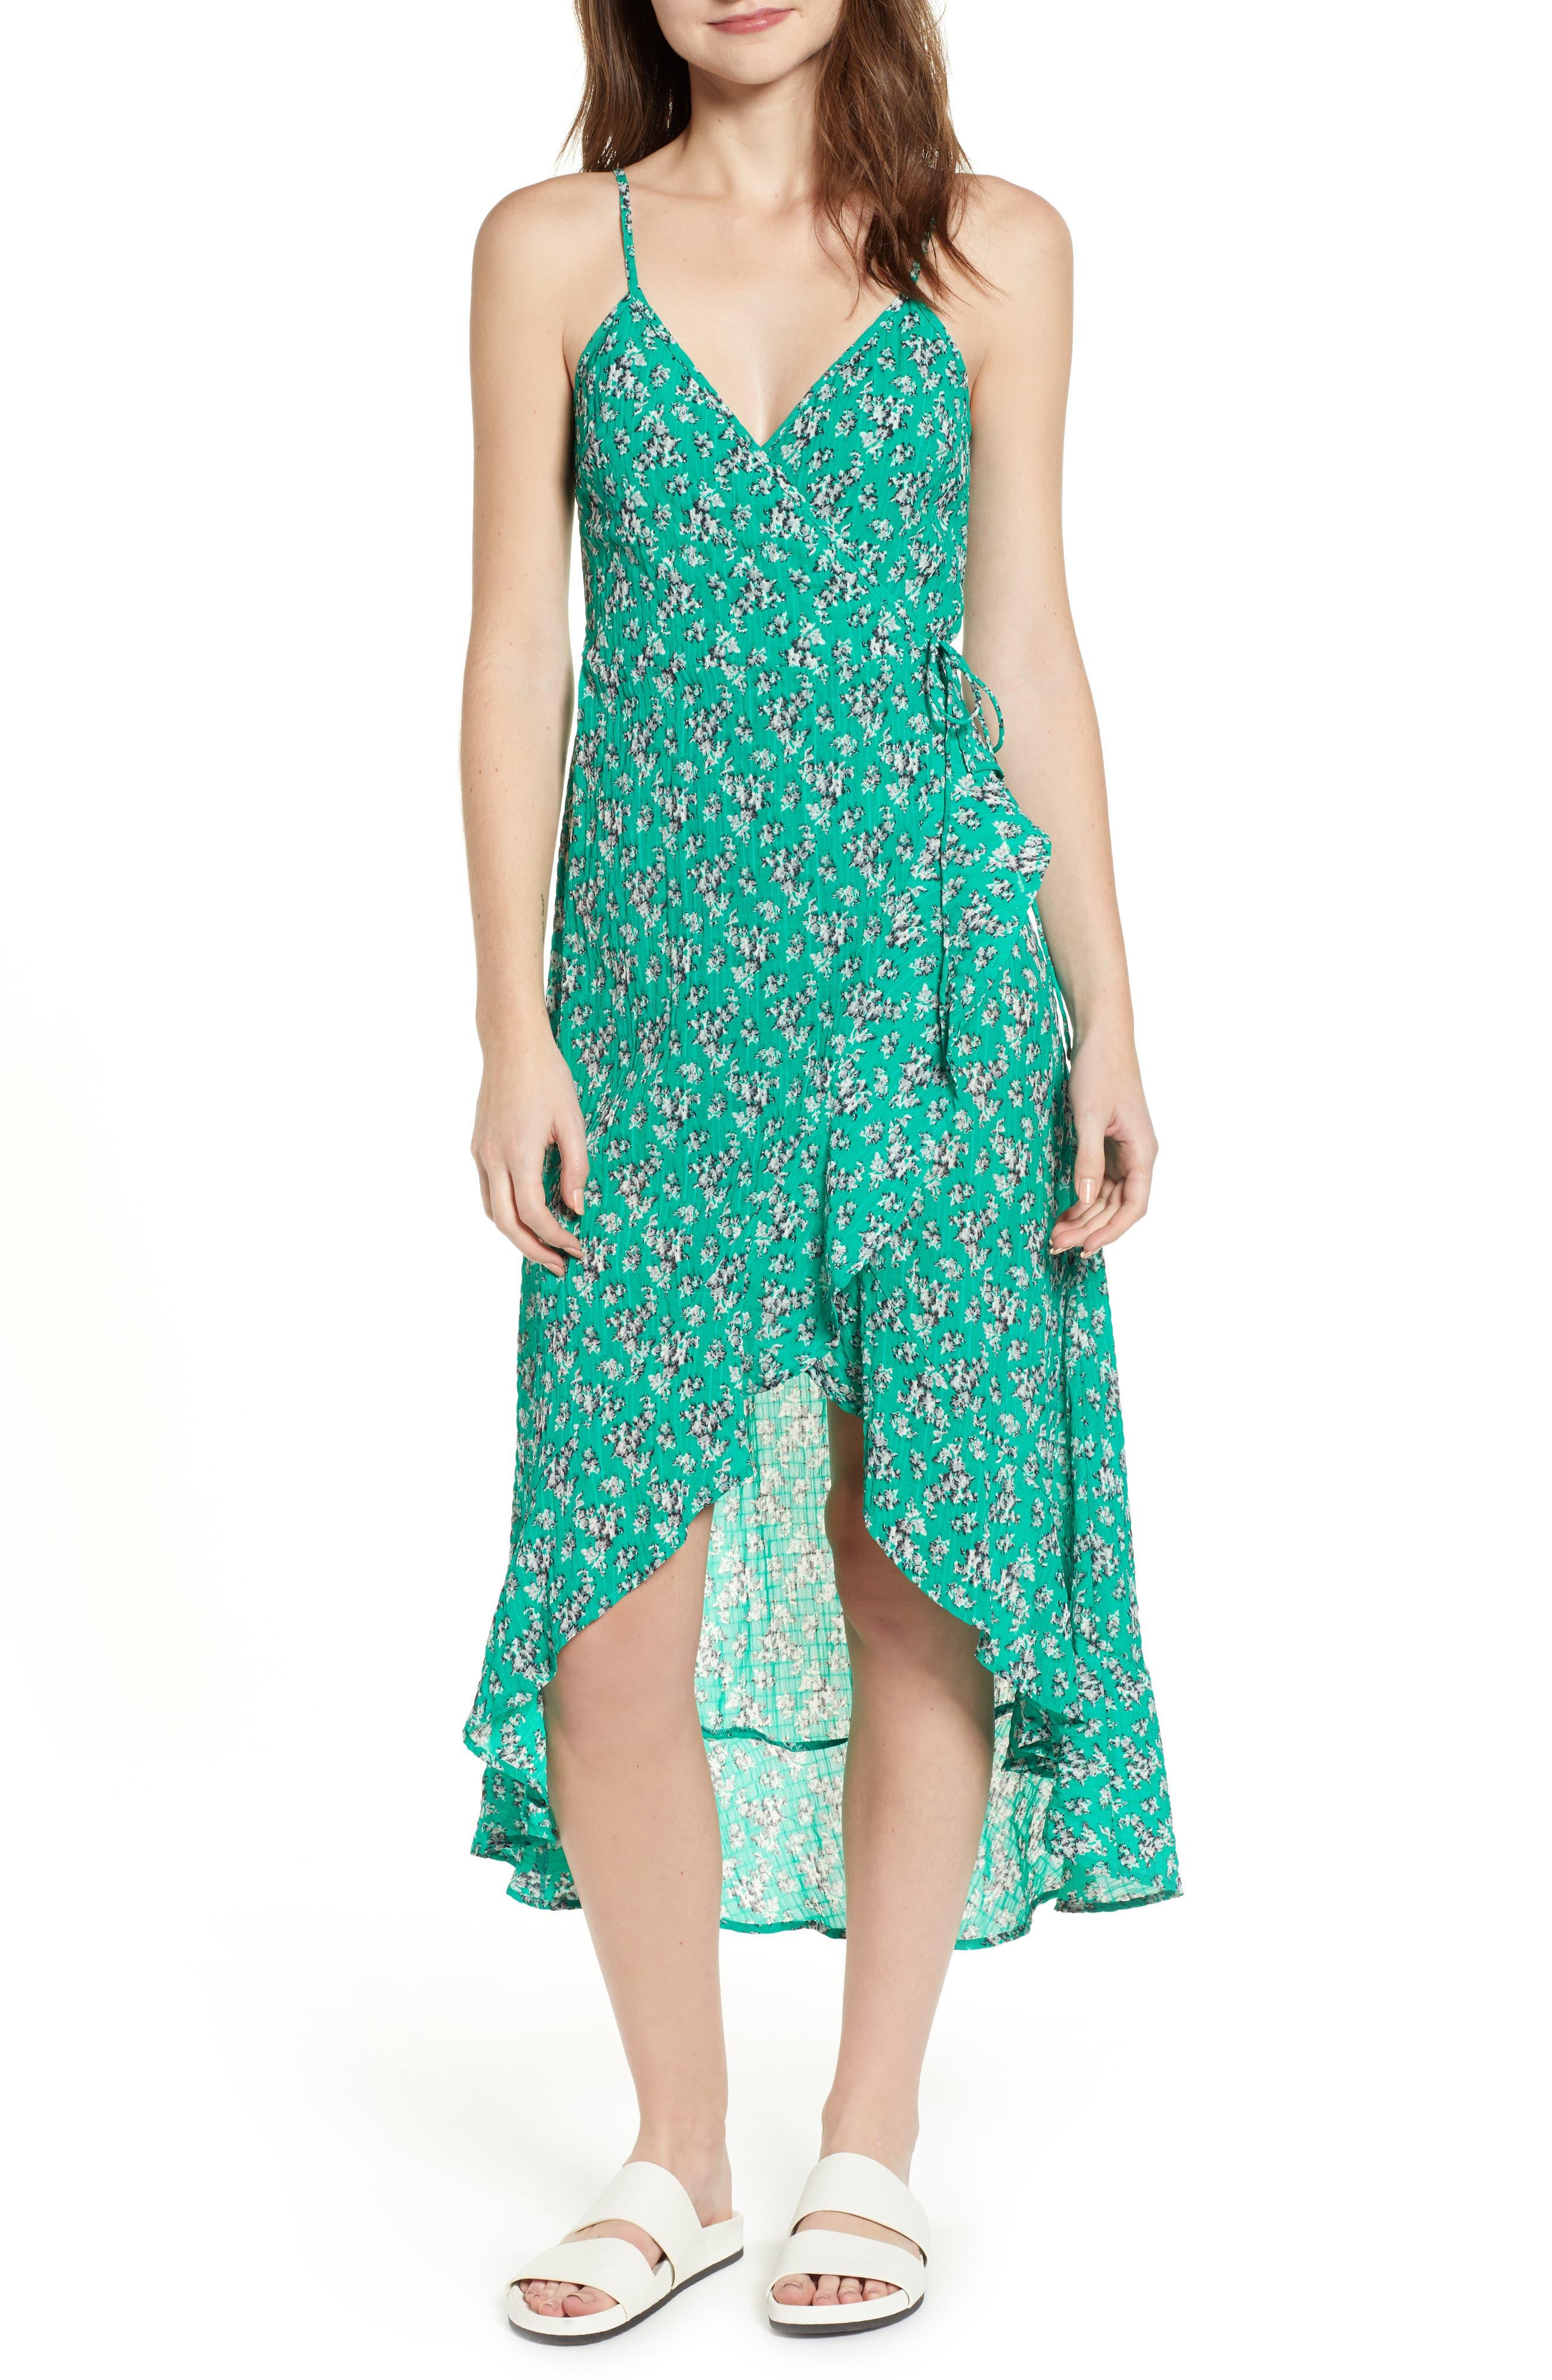 Adventurer Floral Print High/Low Dress, Main, color, GREEN FLORAL